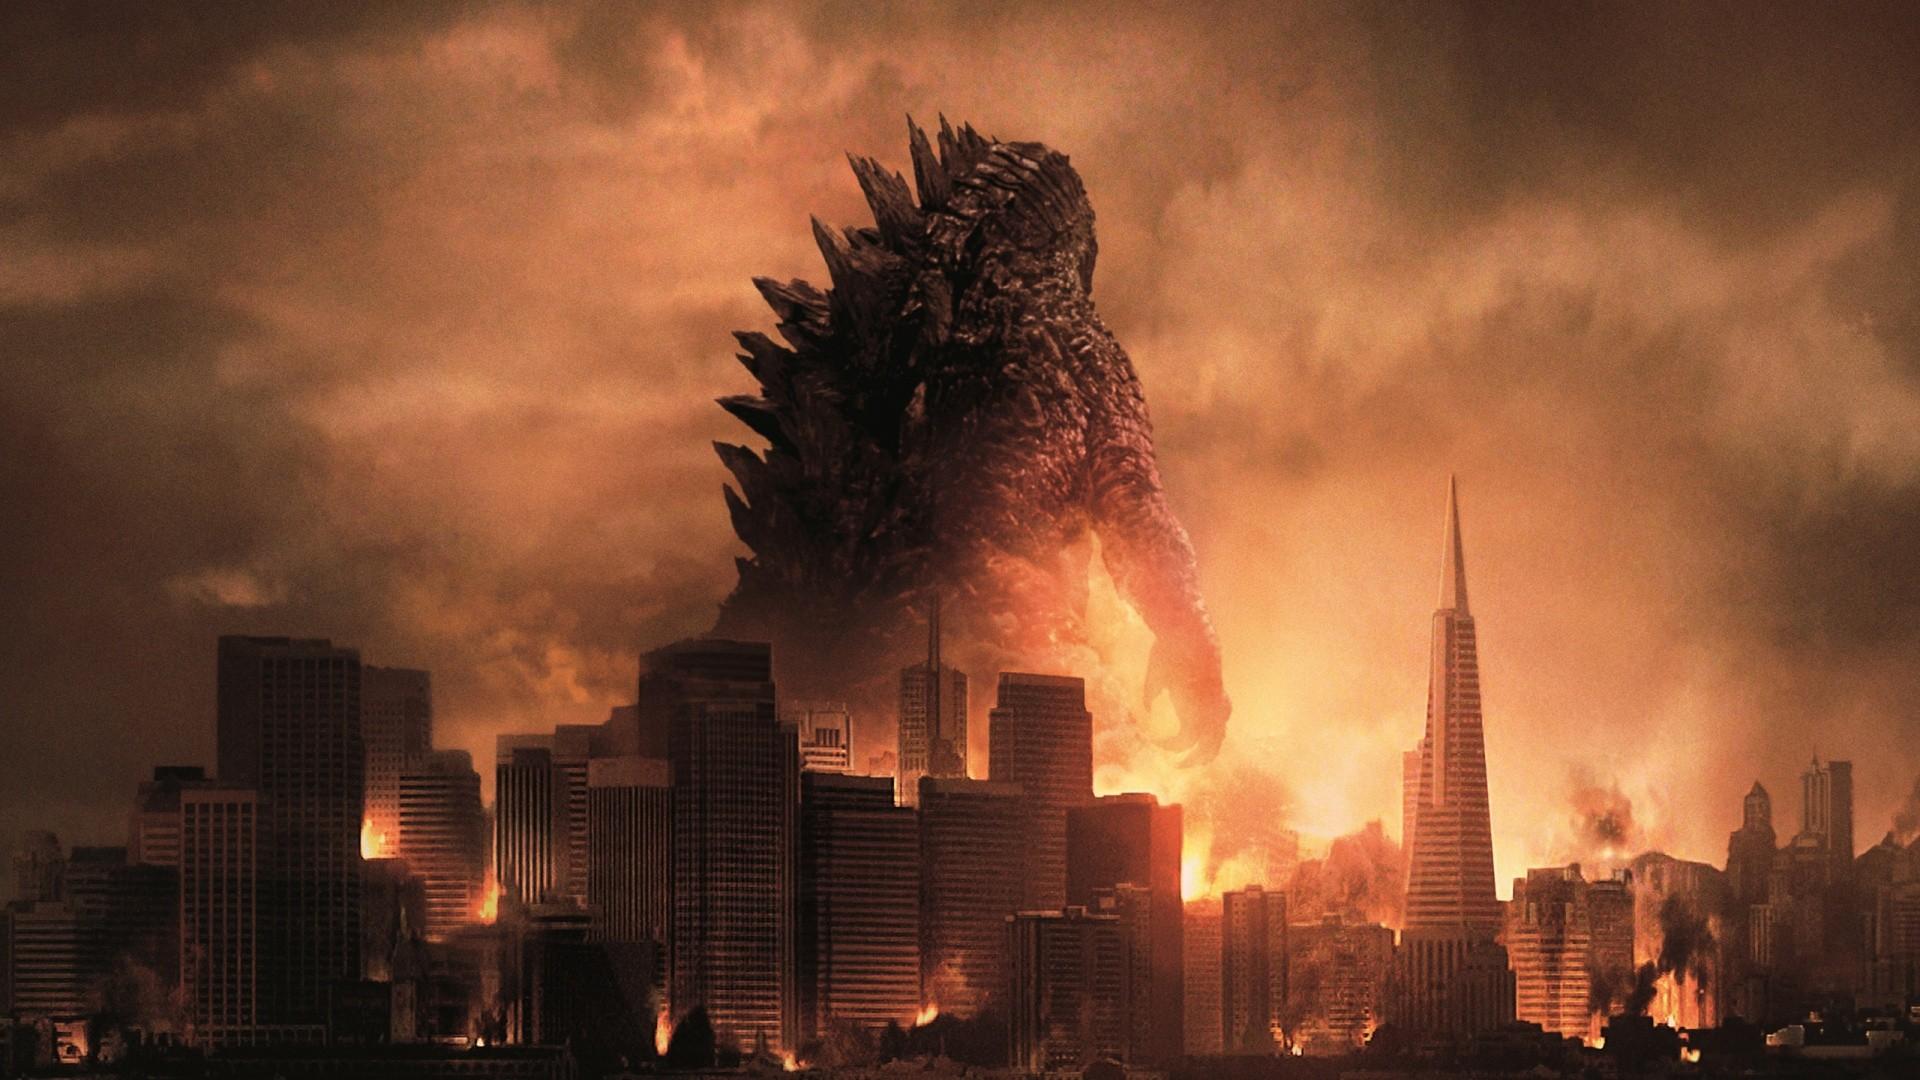 Movie Godzilla Wallpapers X | HD Wallpapers | Pinterest | Godzilla ...